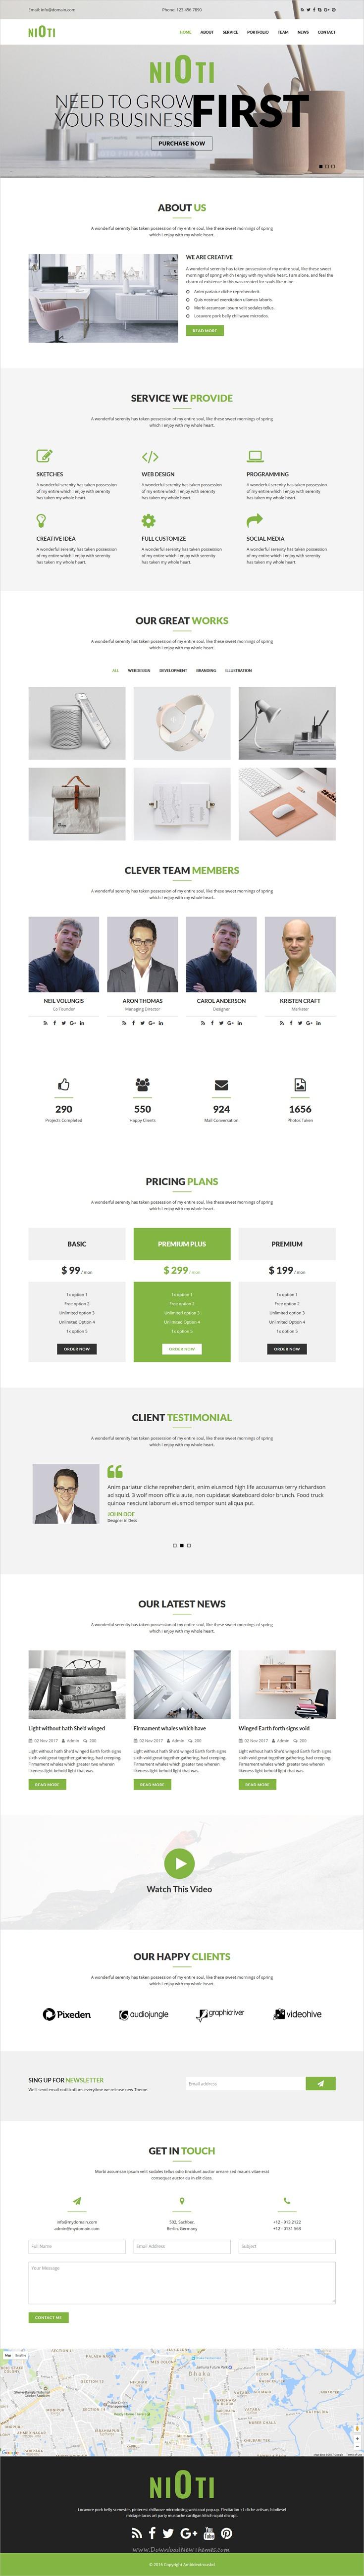 nioti one page multipurpose html template company profile